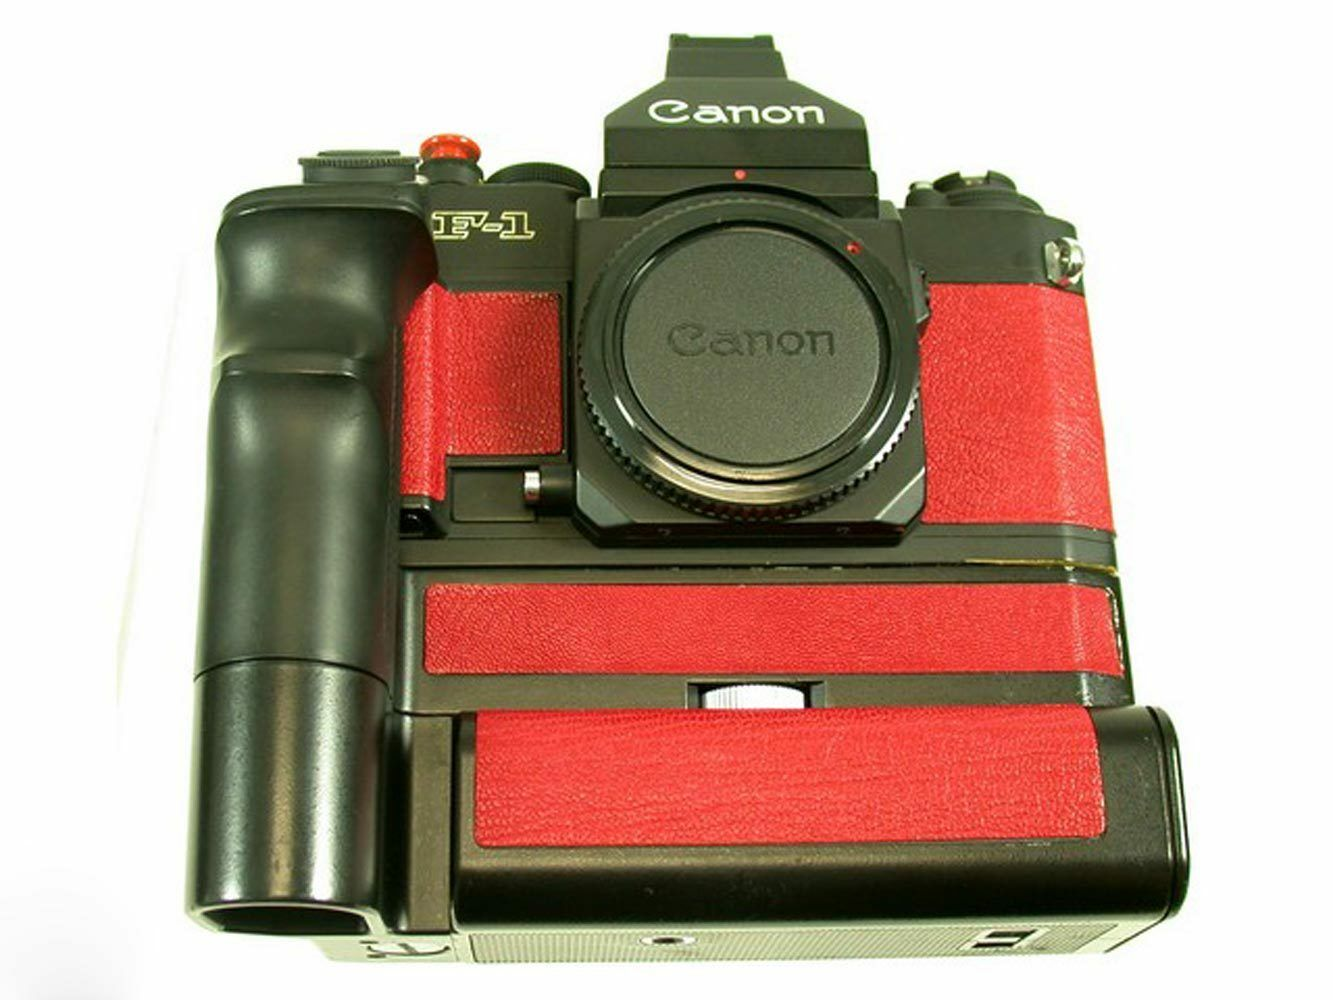 Canon F1 (Pic: camera-gentleman/eBay)